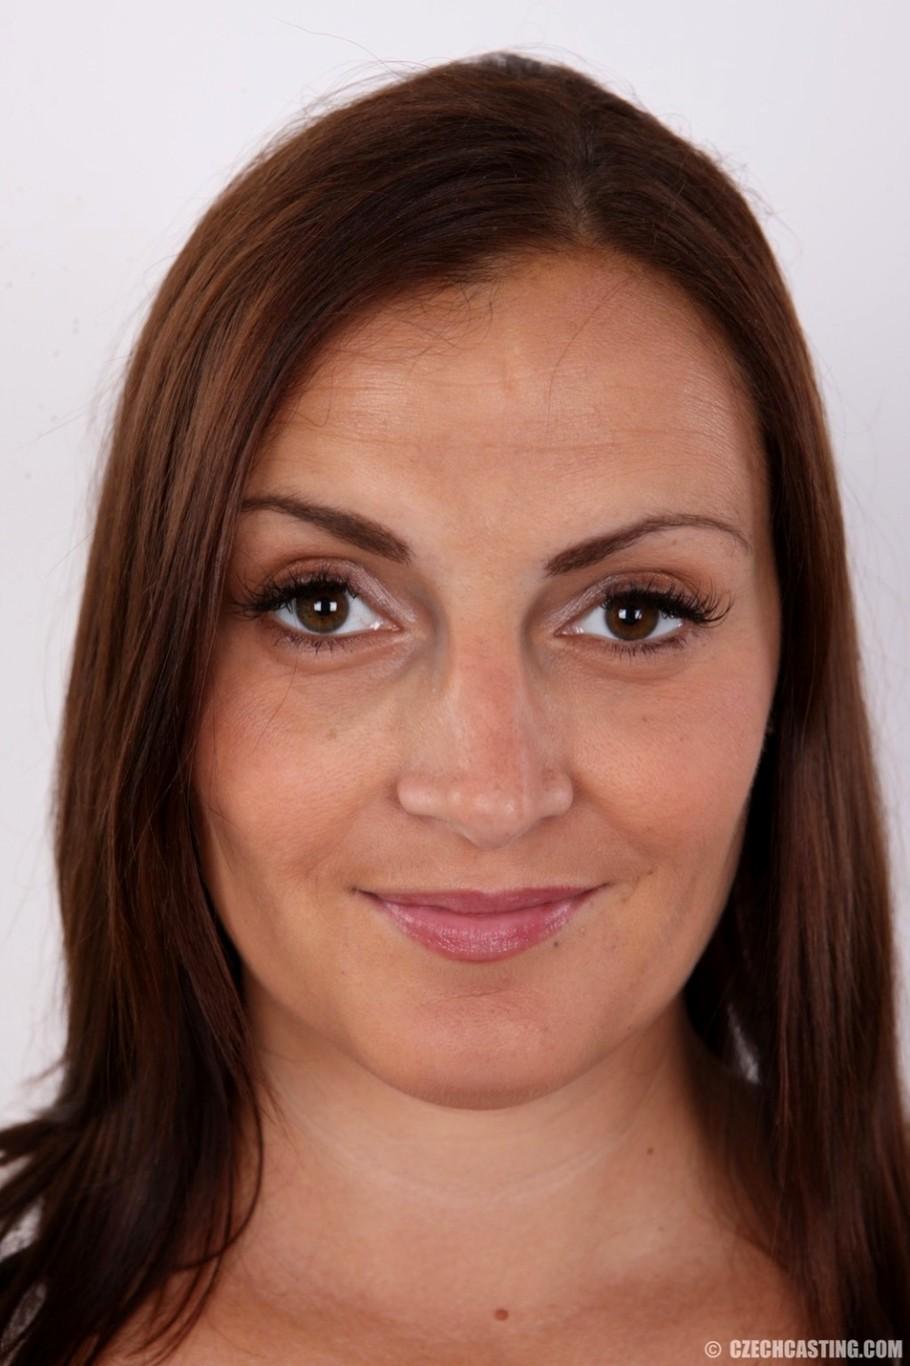 Czech Casting Czechcasting Model Deluxe Brunette Fotos Sex